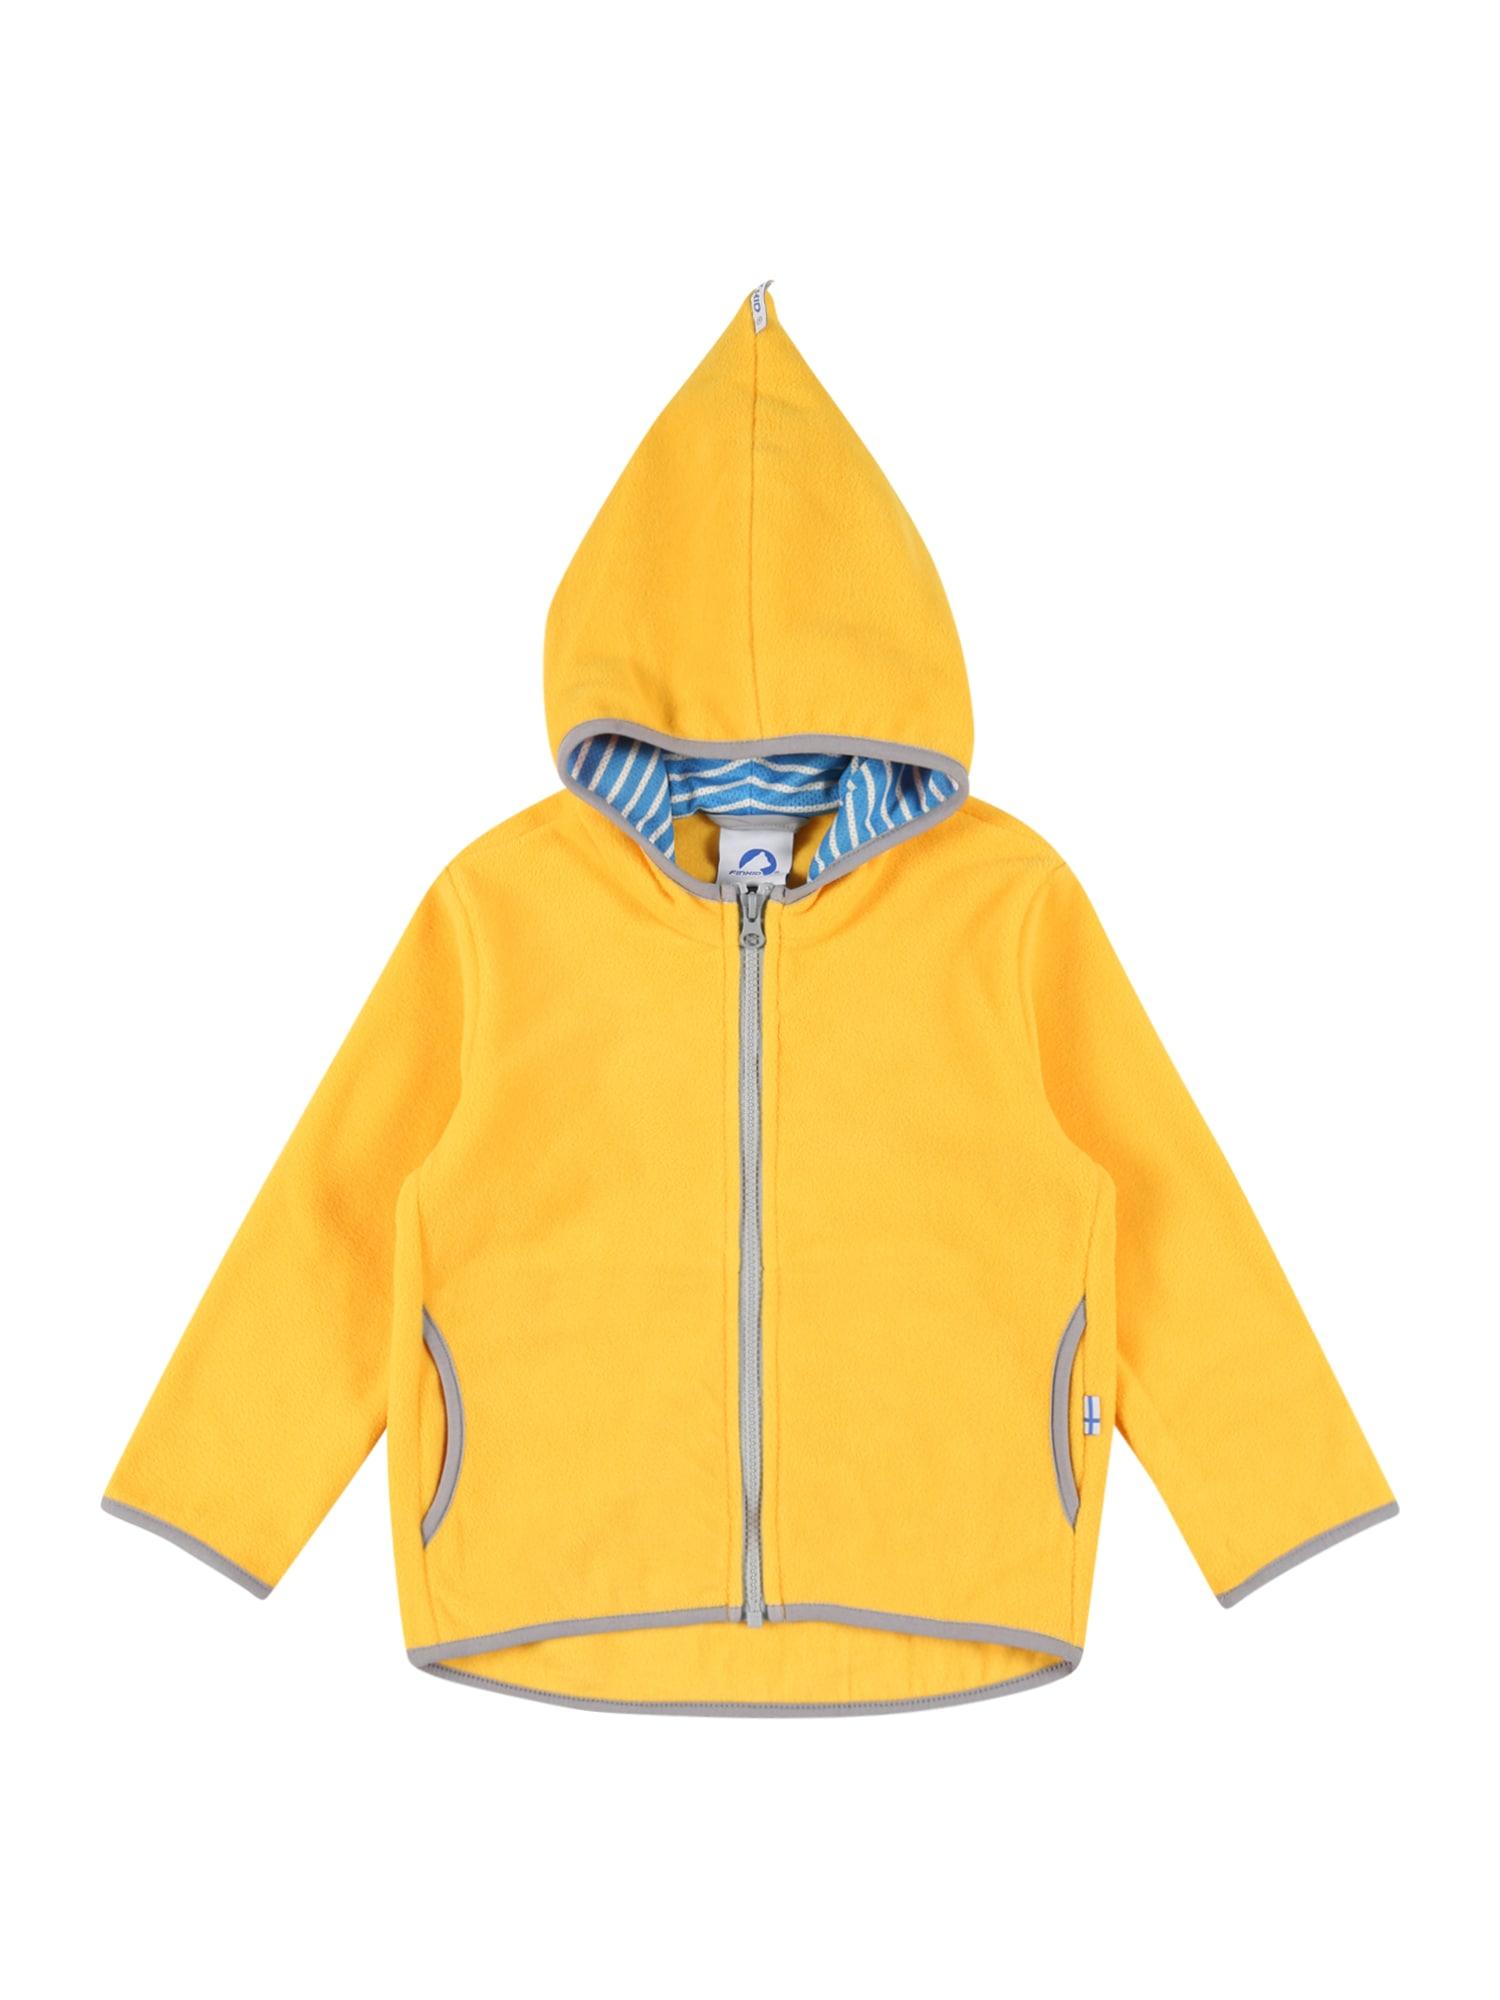 FINKID Flisinis džemperis 'PAUKKU' geltona / pilka